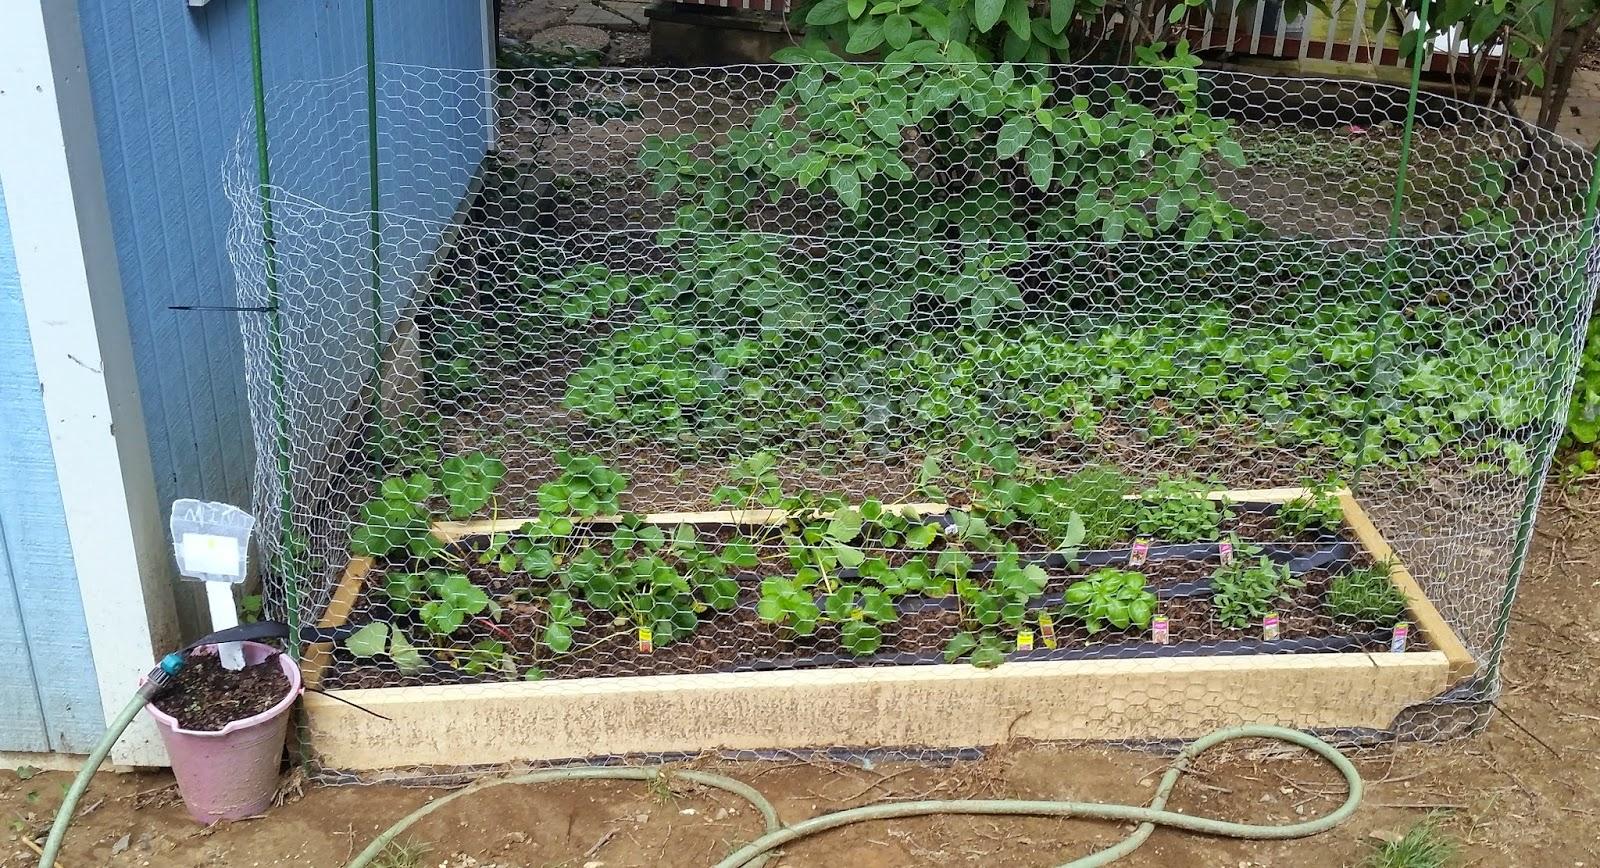 ben 39 s journal gardening progress more chicken wire drip hoses and a tea garden